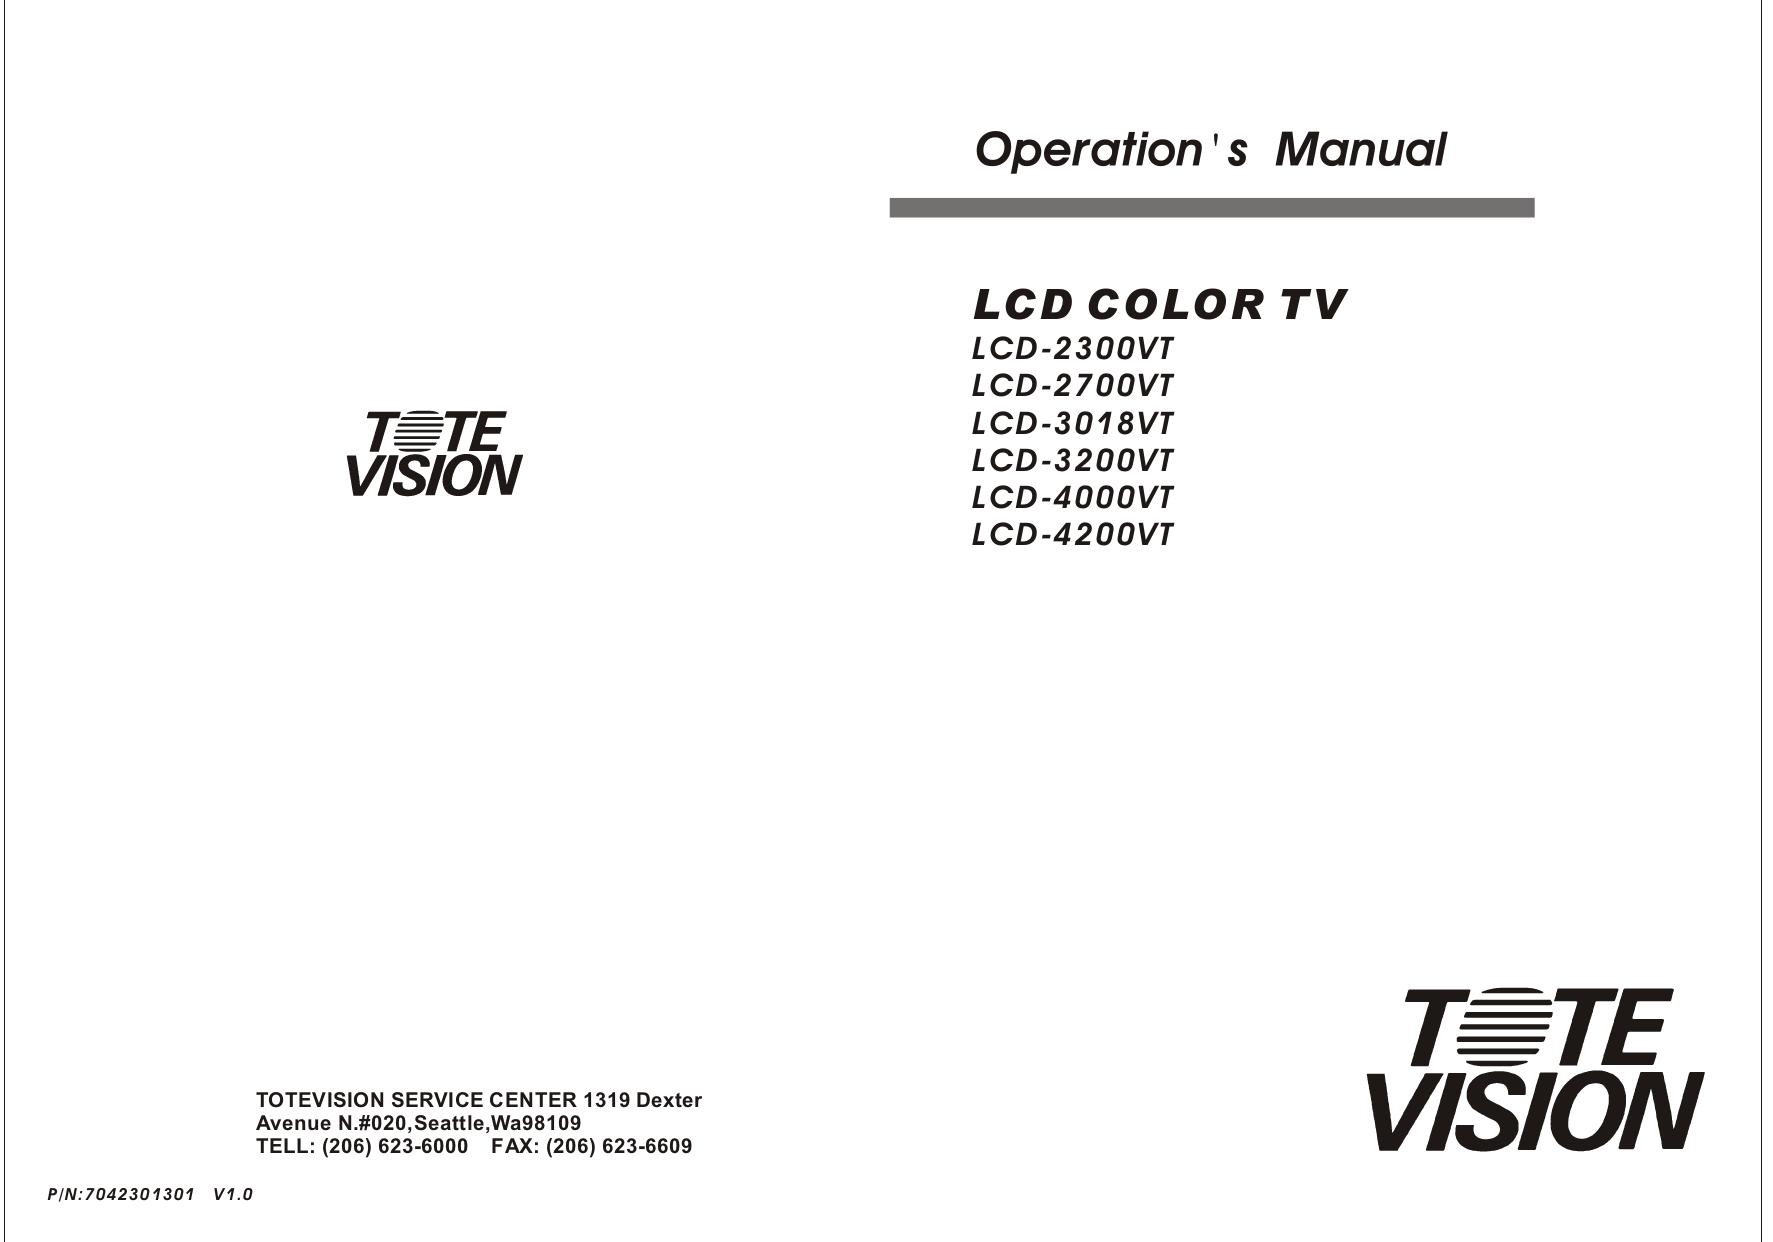 pdf for Totevision TV LCD-3200VT manual